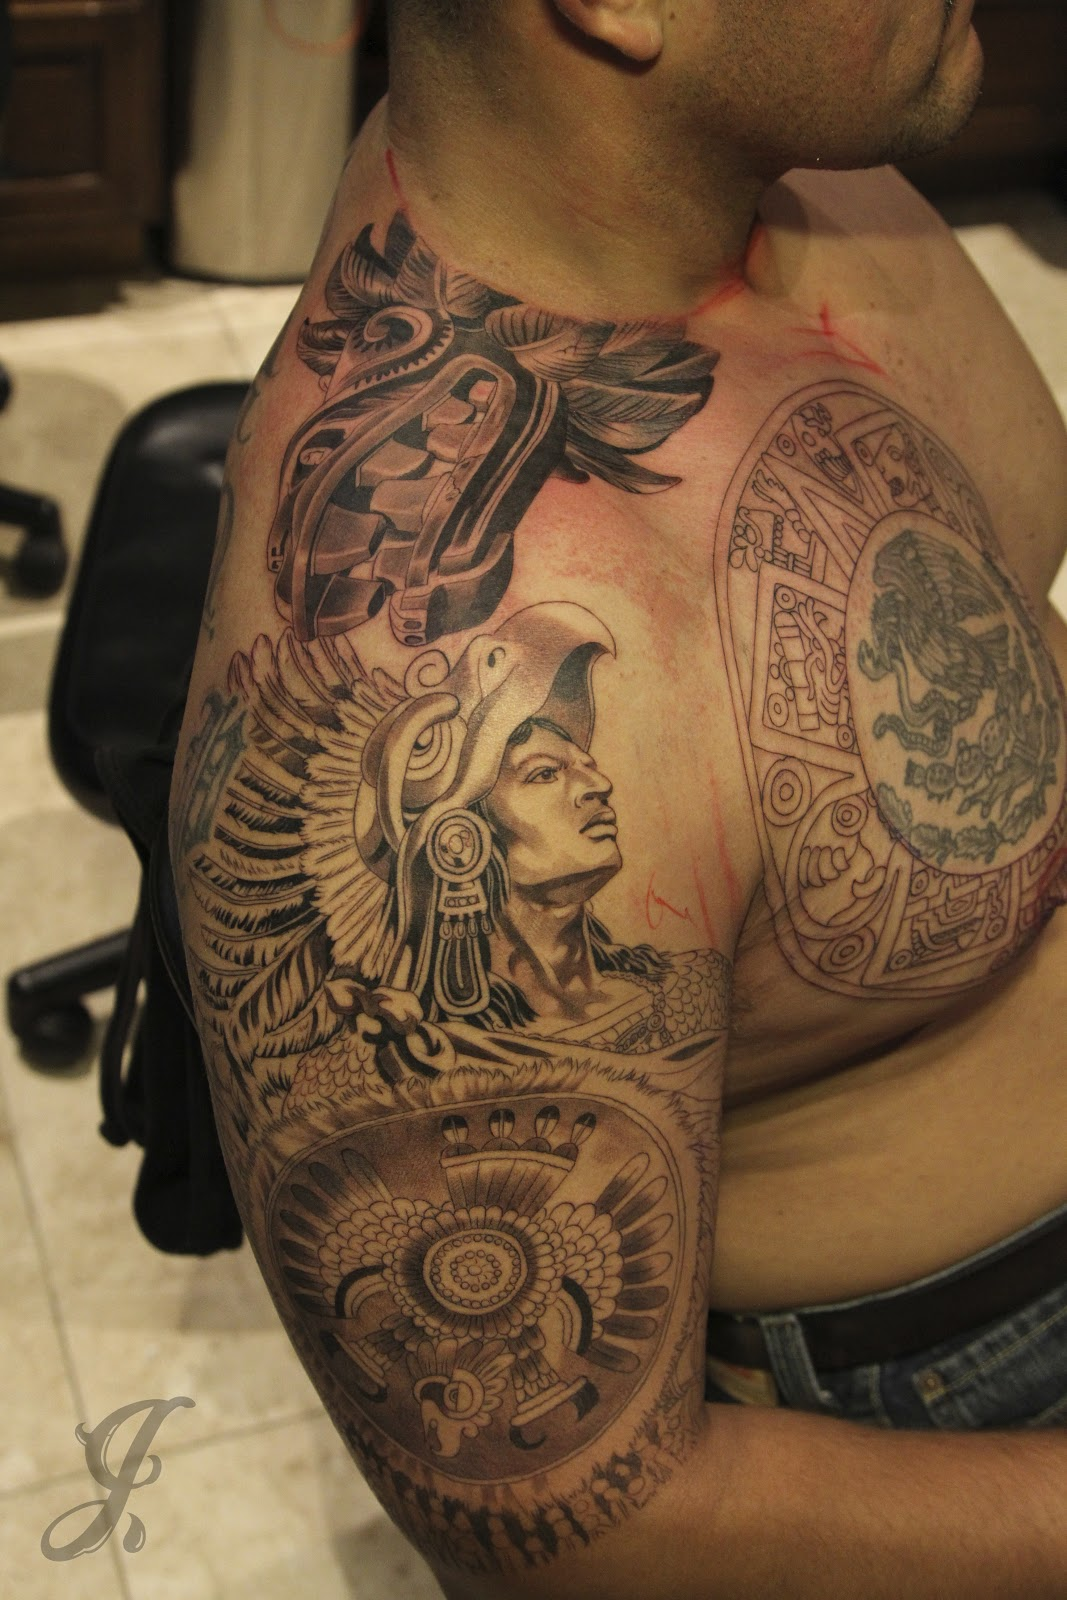 aztec serpent tattoo hot girls wallpaper. Black Bedroom Furniture Sets. Home Design Ideas